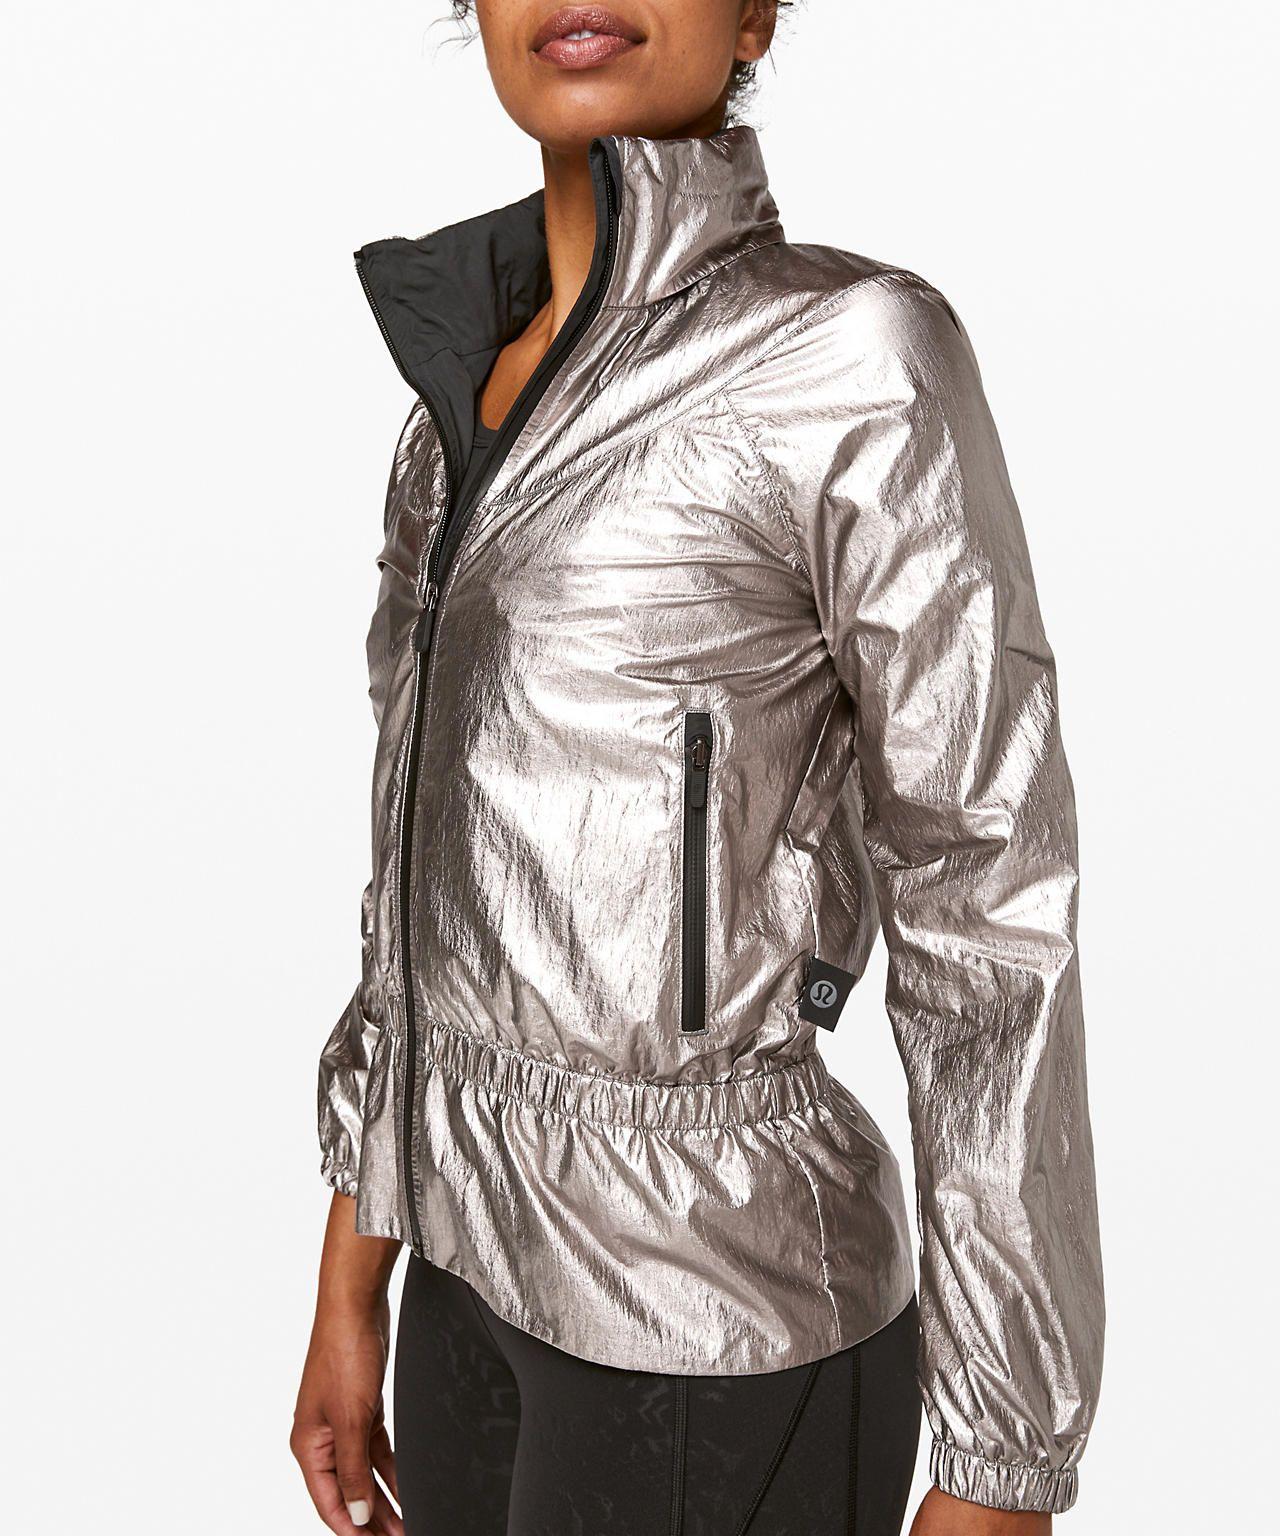 Stronger As One Jacket Lululemon X Barry S Women S Jackets Coats Lululemon Athletica Jackets For Women Technical Clothing Coats Jackets Women [ 1536 x 1280 Pixel ]